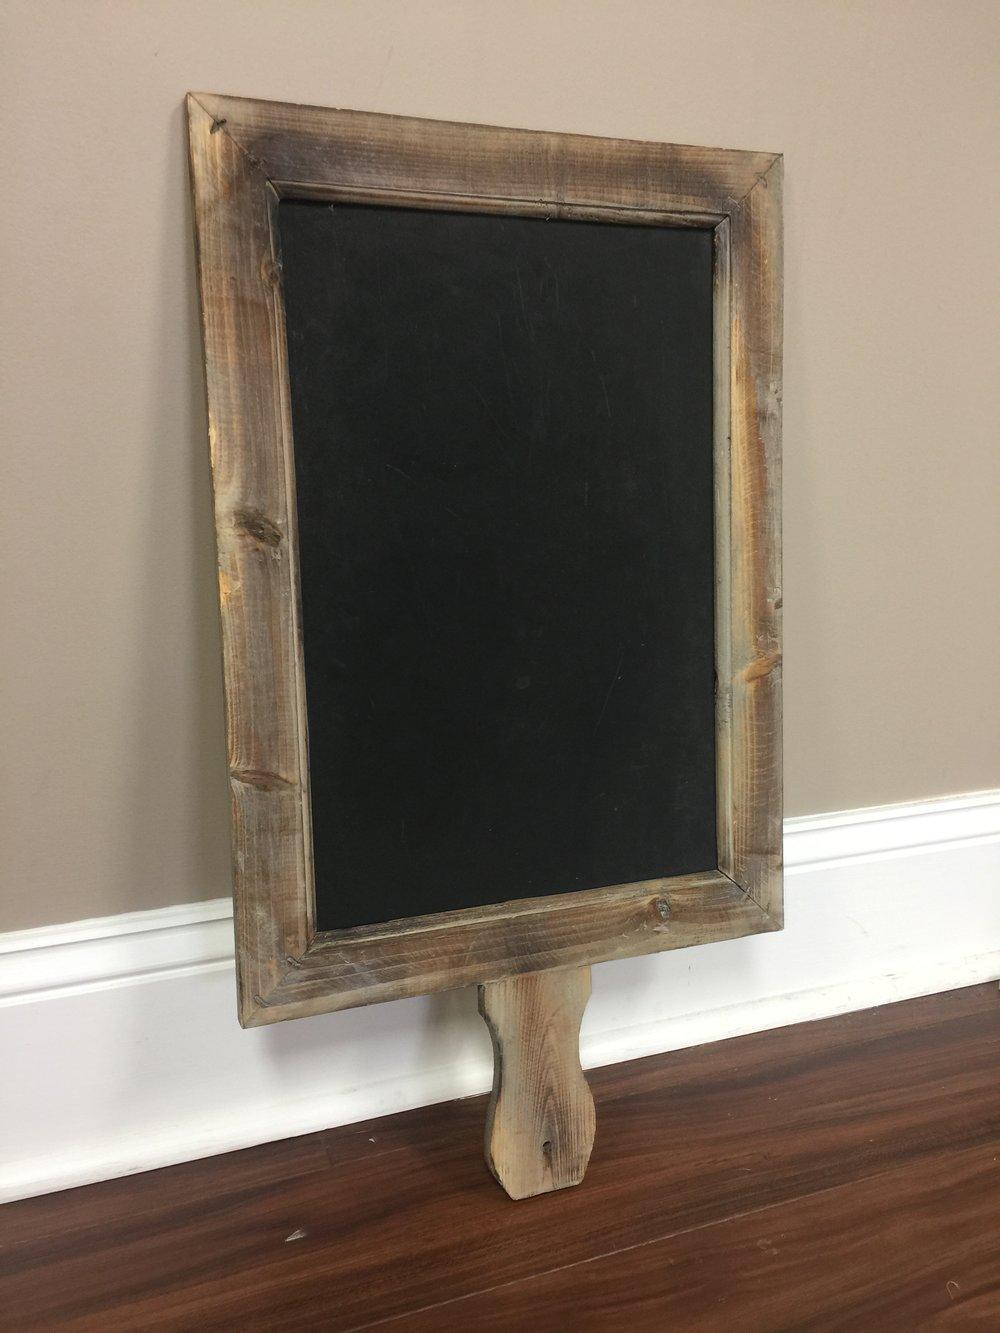 "Chalkboard Paddle    Chalkboard Height: 16.5"" Chalkboard Width: 11""    Paddle Height: 25.5"" Paddle Width: 14.5""   $5/each // Qty: 1"